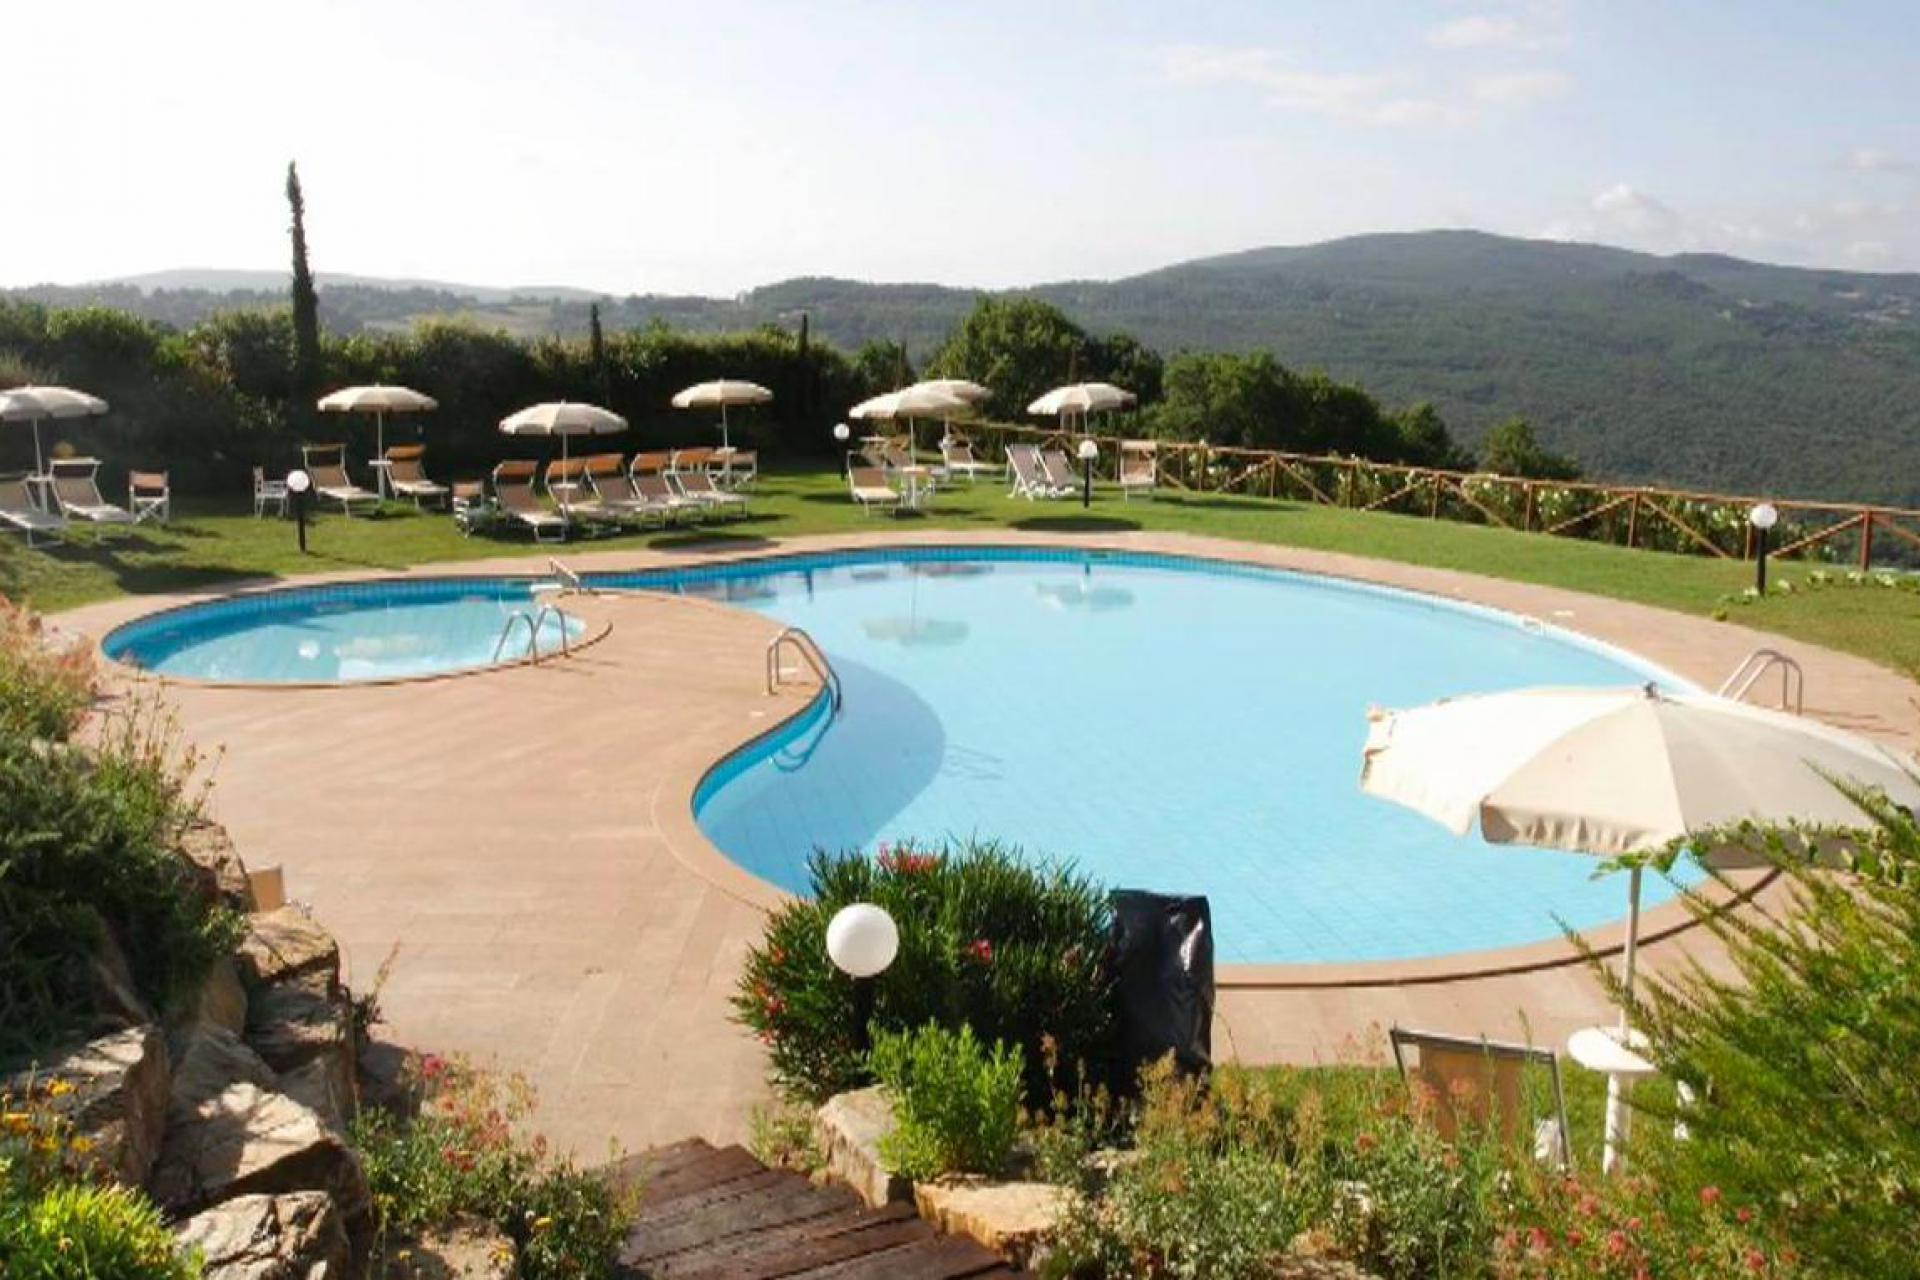 Agriturismo Toscane Grote agriturismo Toscane met zwembad | myitaly.nl